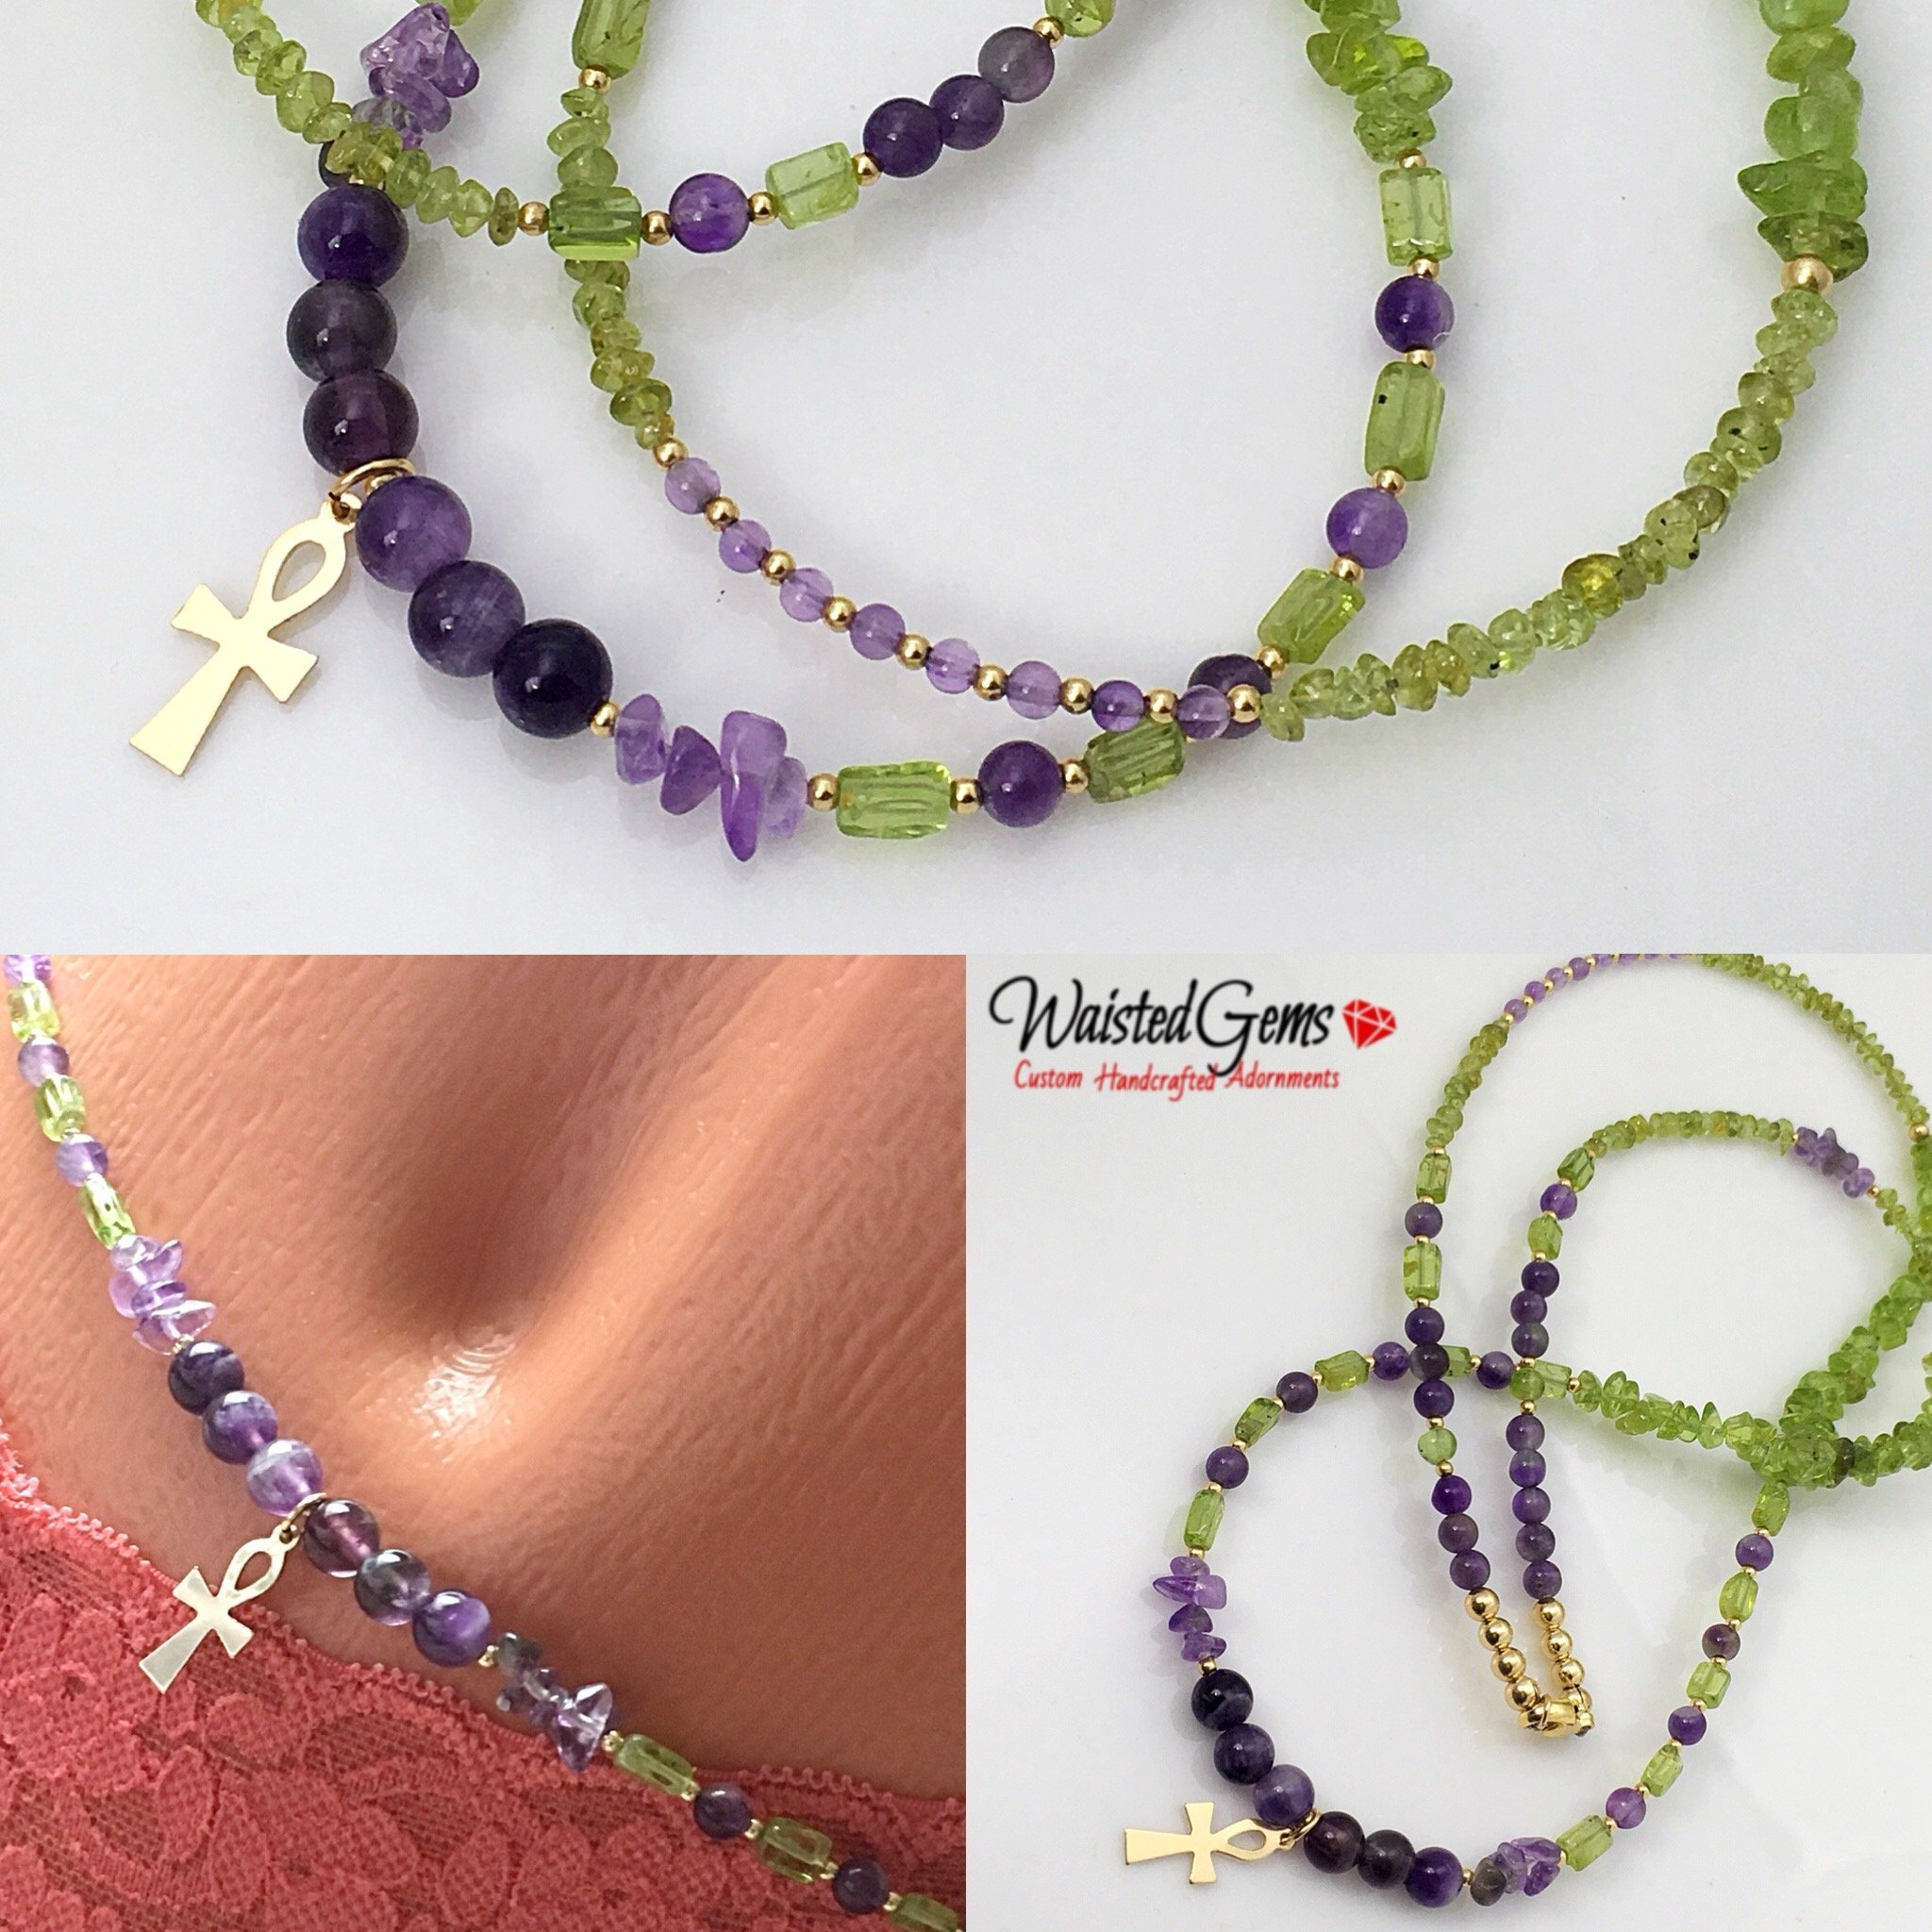 14k Peridot and Amethyst, African Waist Beads Waist Beads , Leo Birthday Waistbeads, Leo Birthday gifts, belly chain, body Jewelry, gemstone